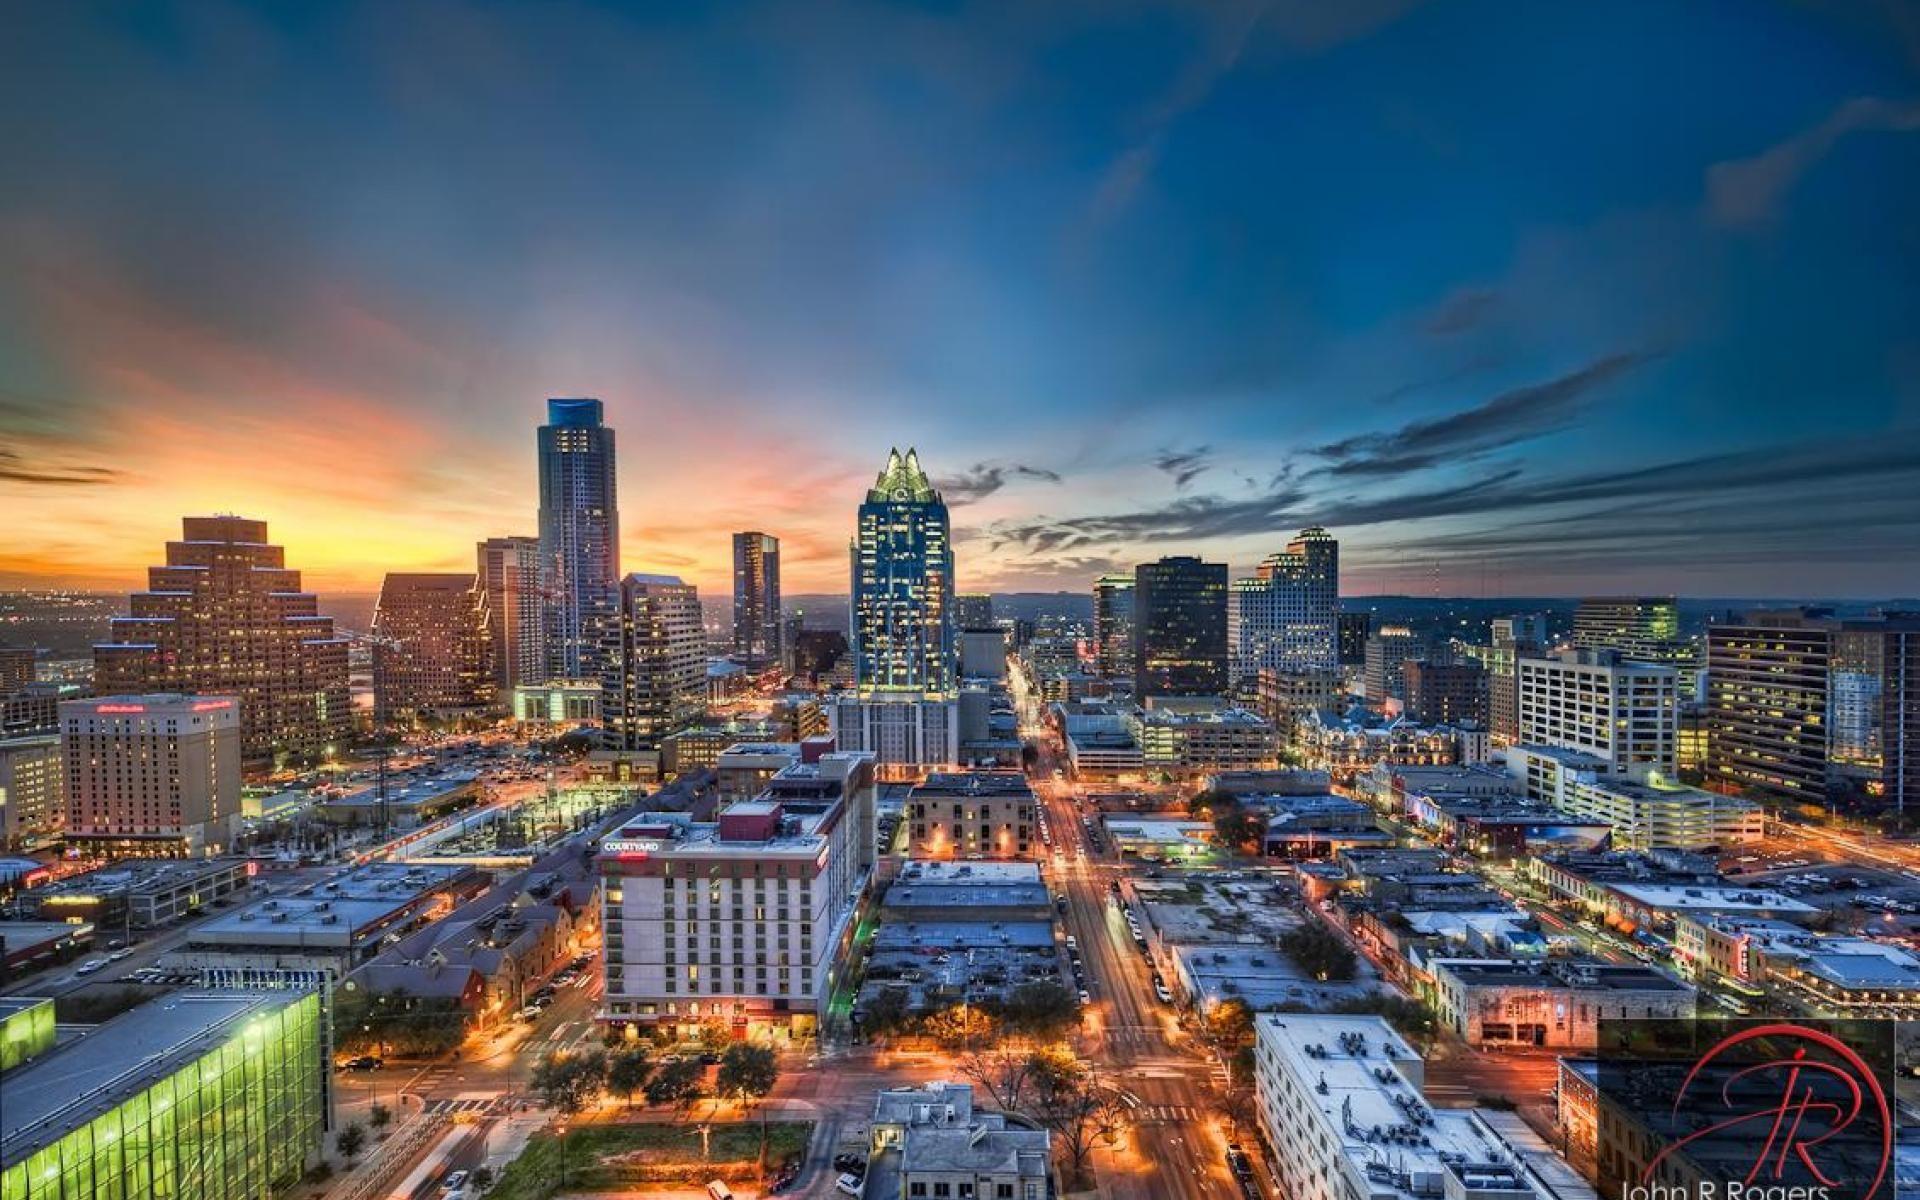 Austin Texas High Quality and Resolution Austin skyline